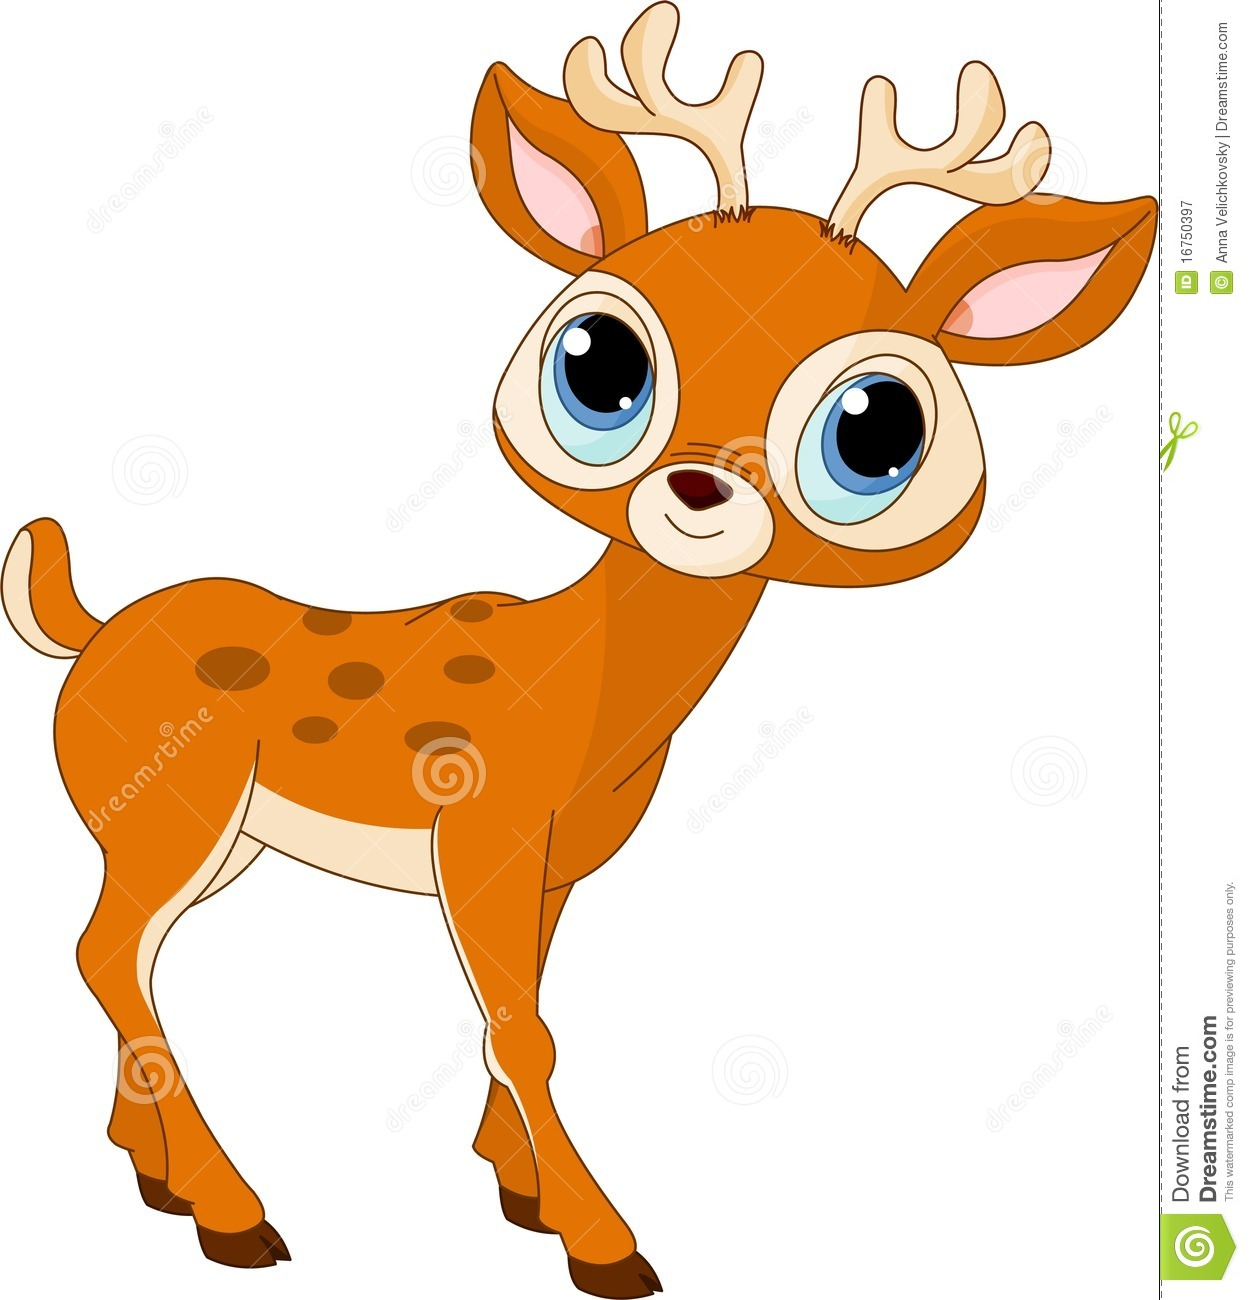 baby deer clip art clipart panda free clipart images rh clipartpanda com Baby Deer Silhouette Clip Art free baby deer clipart